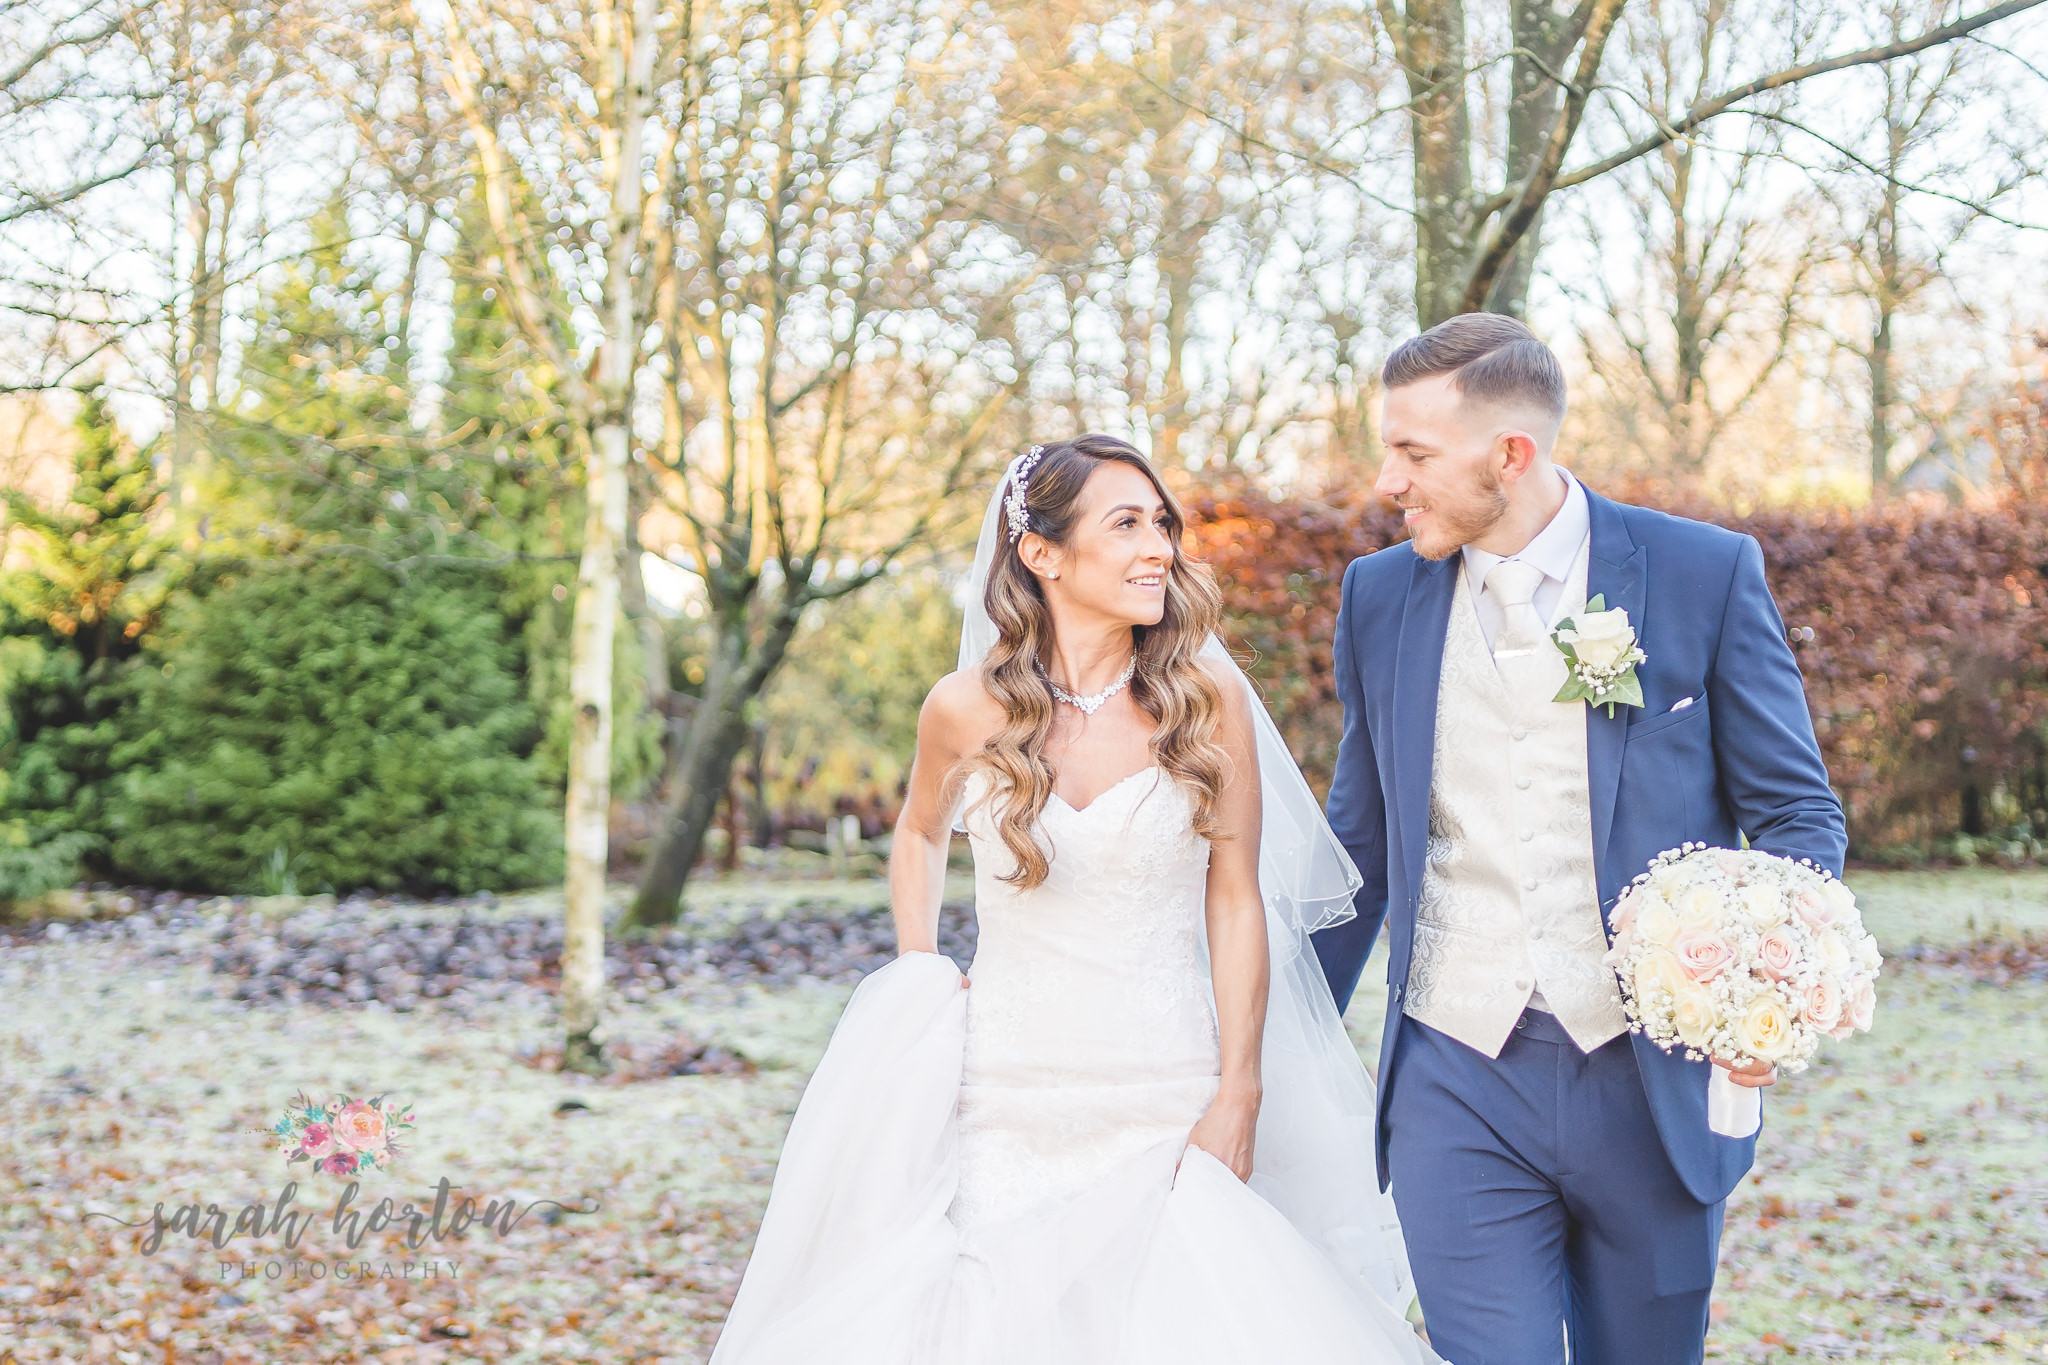 Winter Wedding At Nunsmere Hall